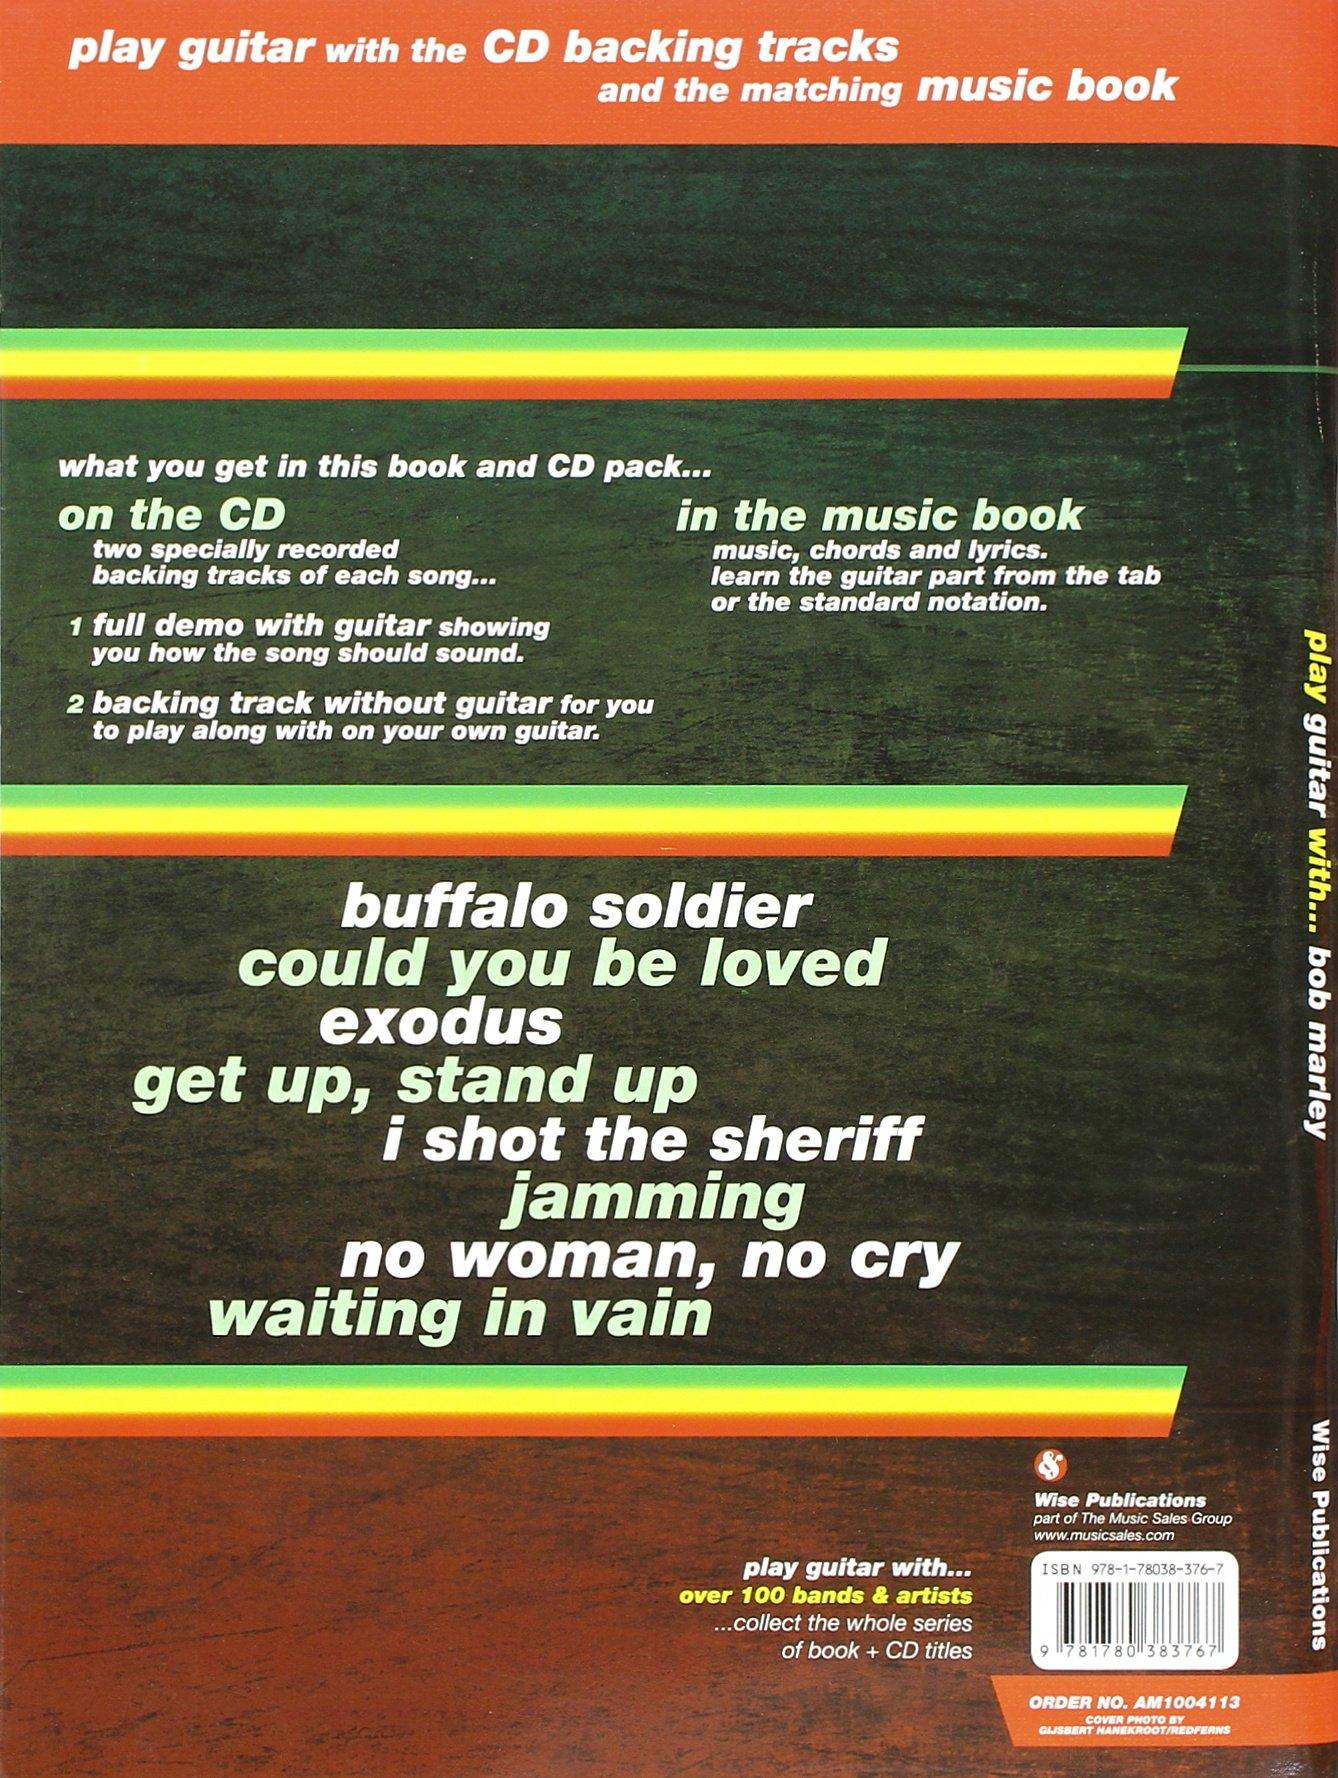 Play Guitar With Bob Marley New Edition 9781780383767 Amazon